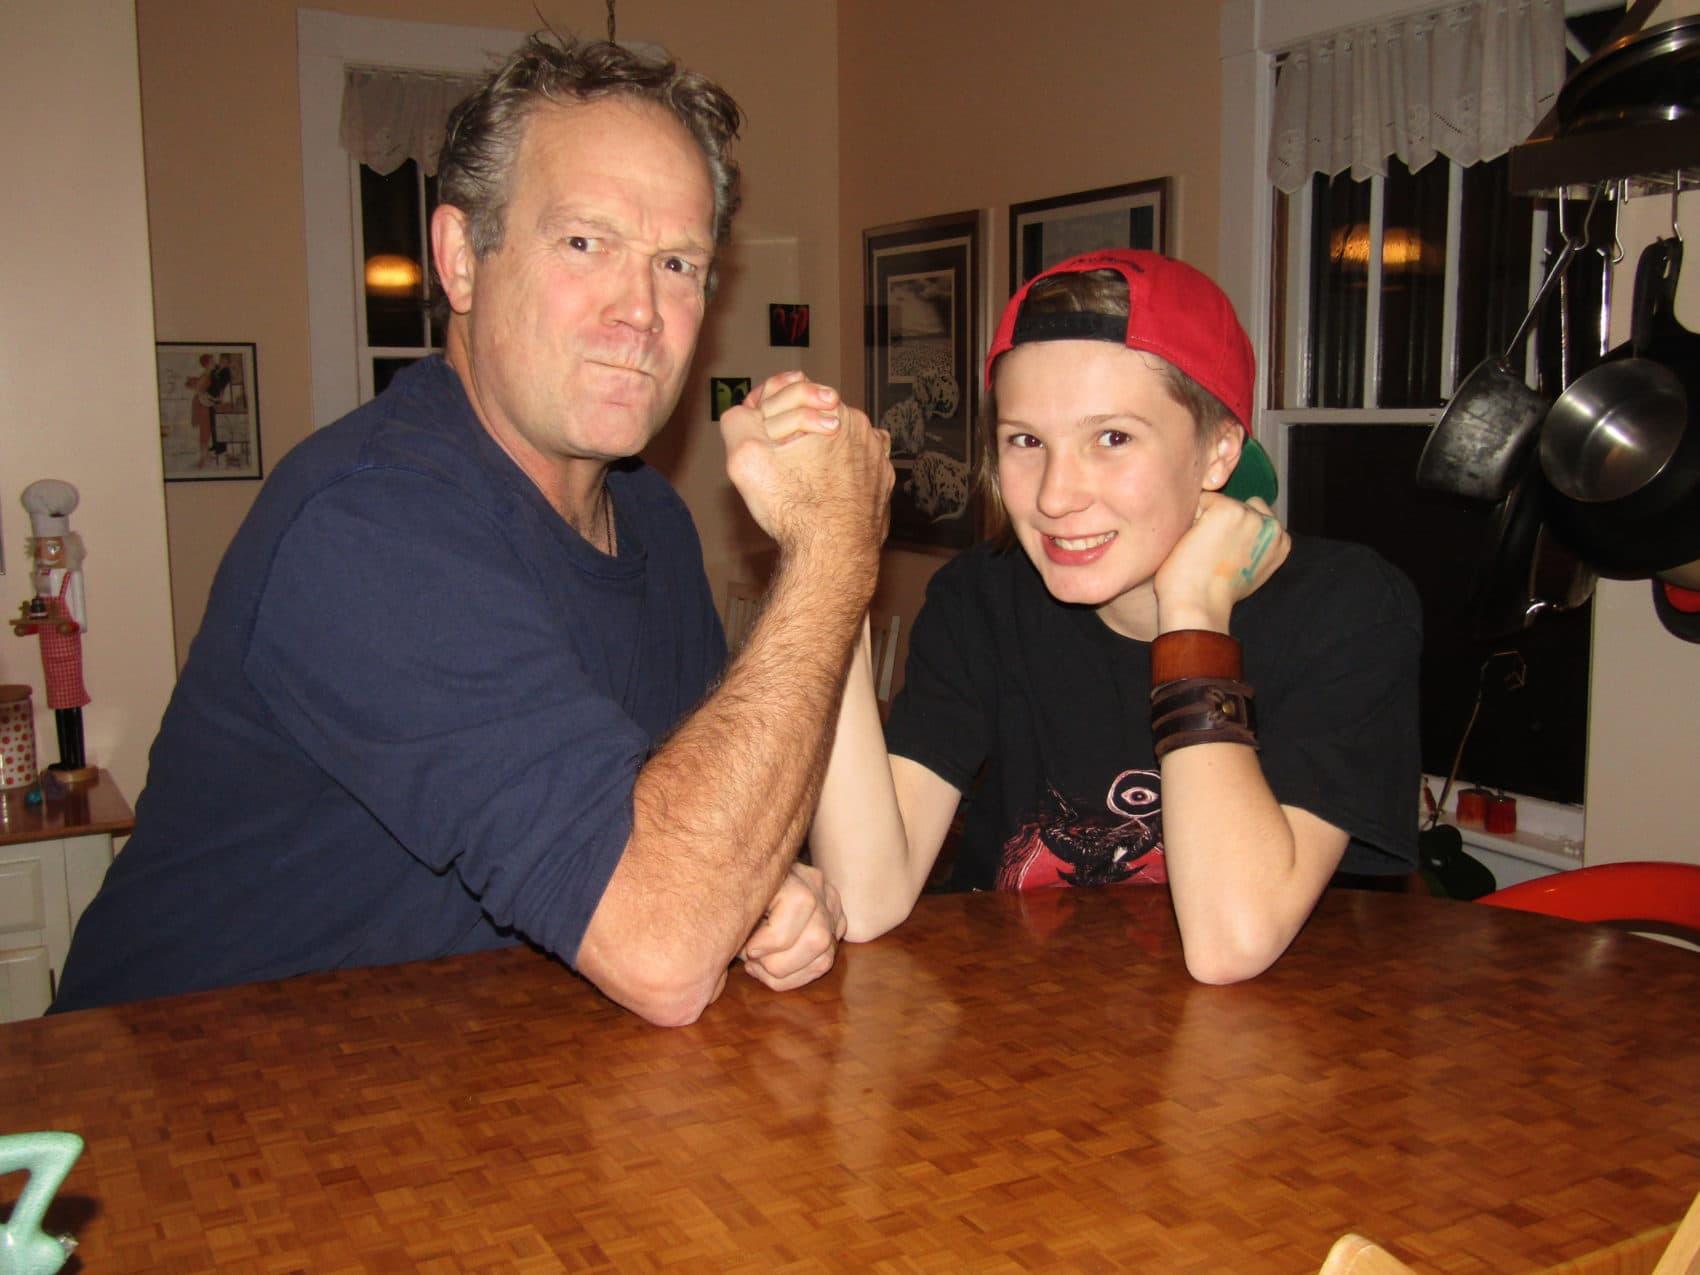 Rand Richards Cooper and his daughter Larkin